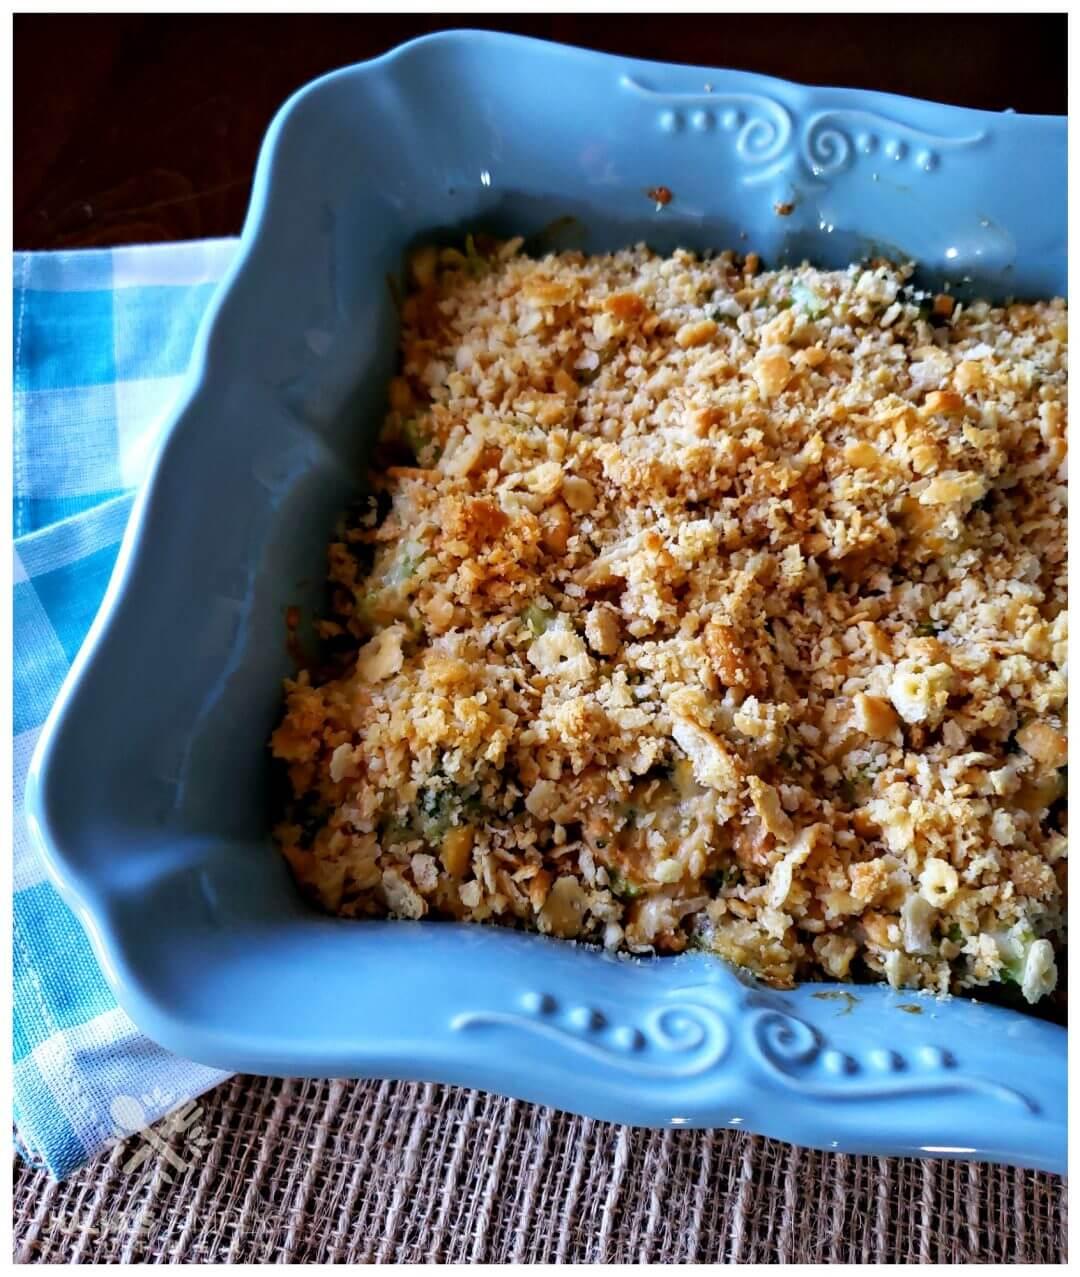 Classic Broccoli Casserole Recipe with Ritz Crackers in a square teal casserole dish